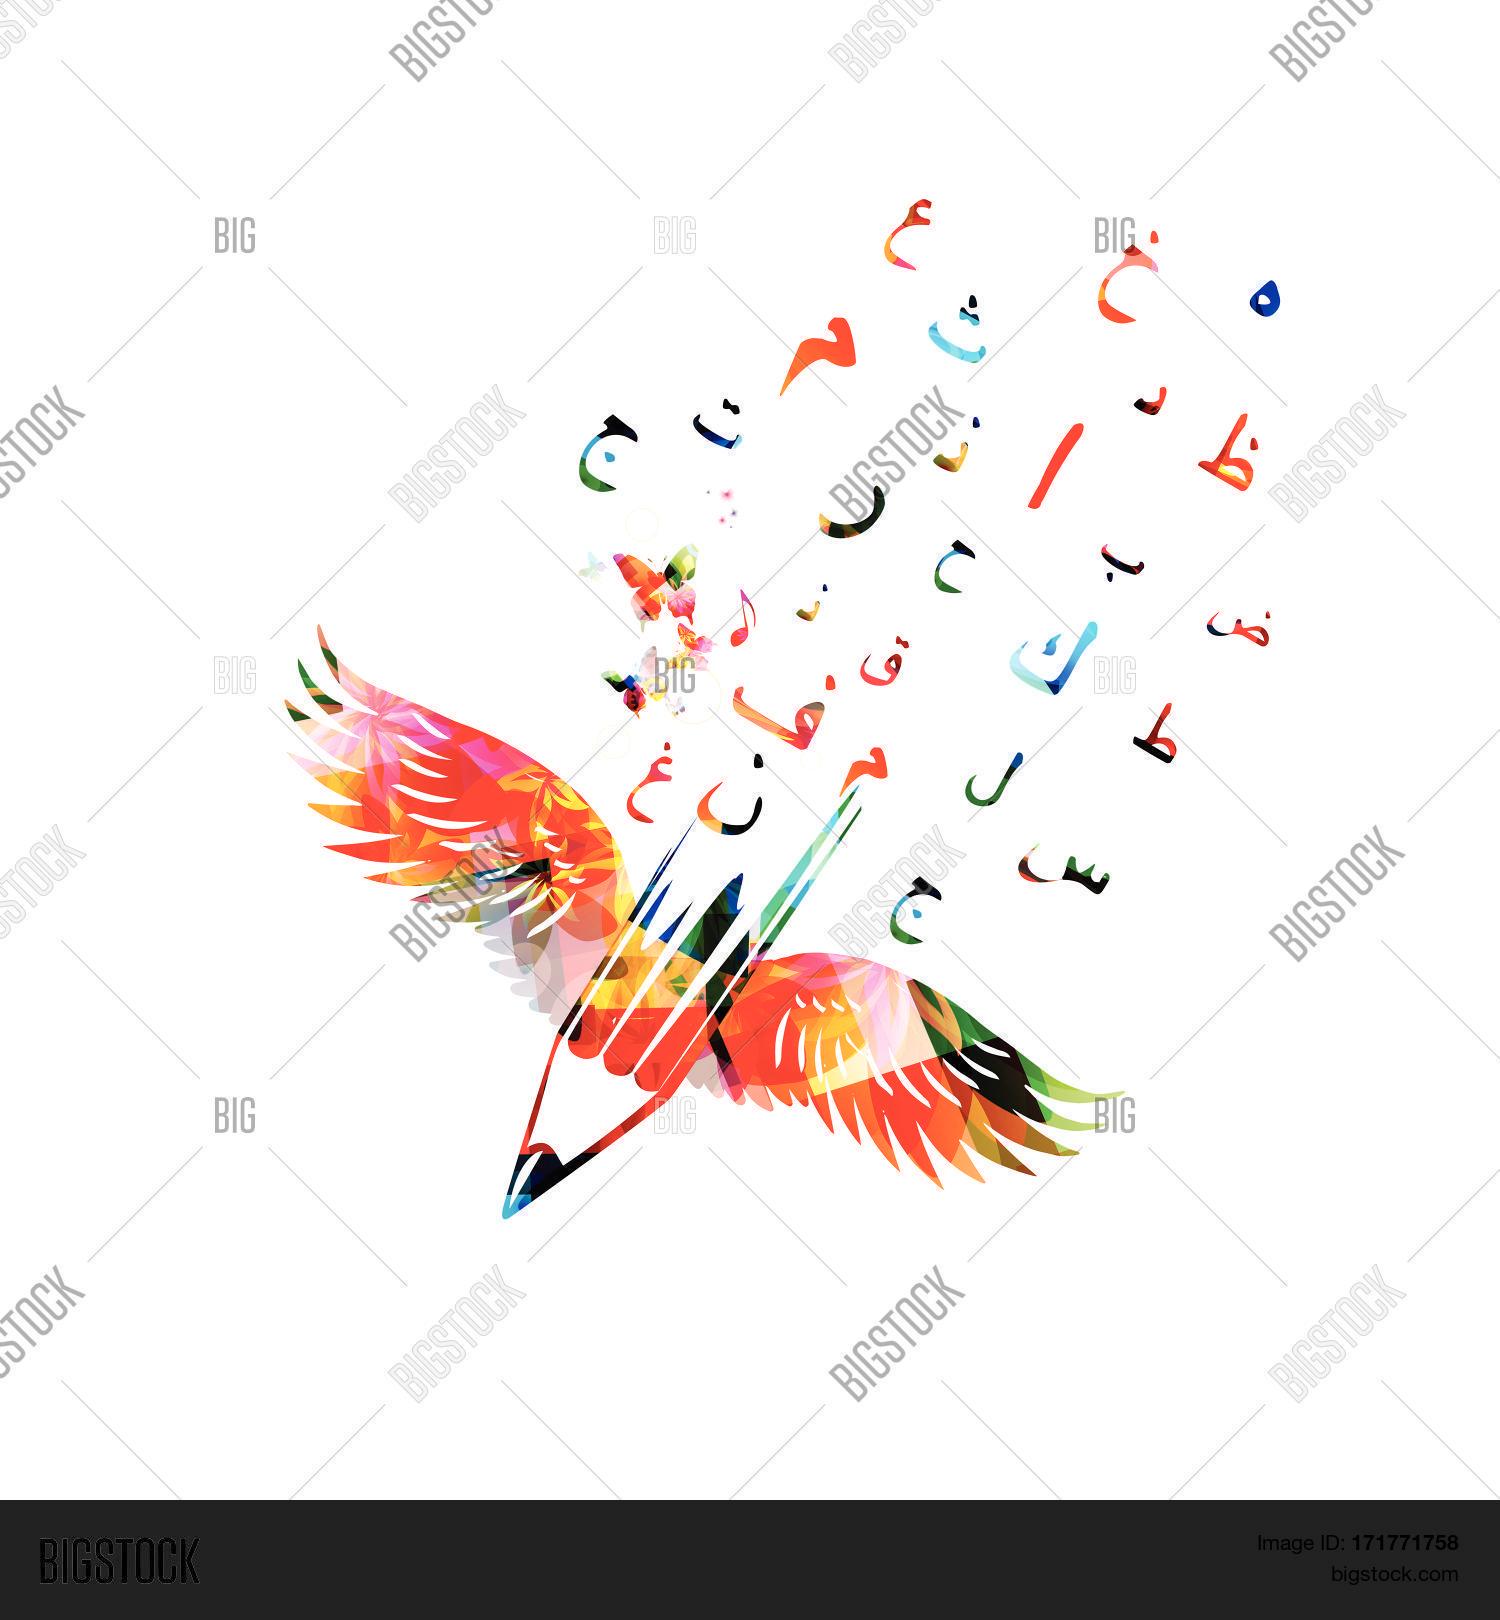 Arabic Book Cover Design Vector : Colorful pencil vector photo free trial bigstock